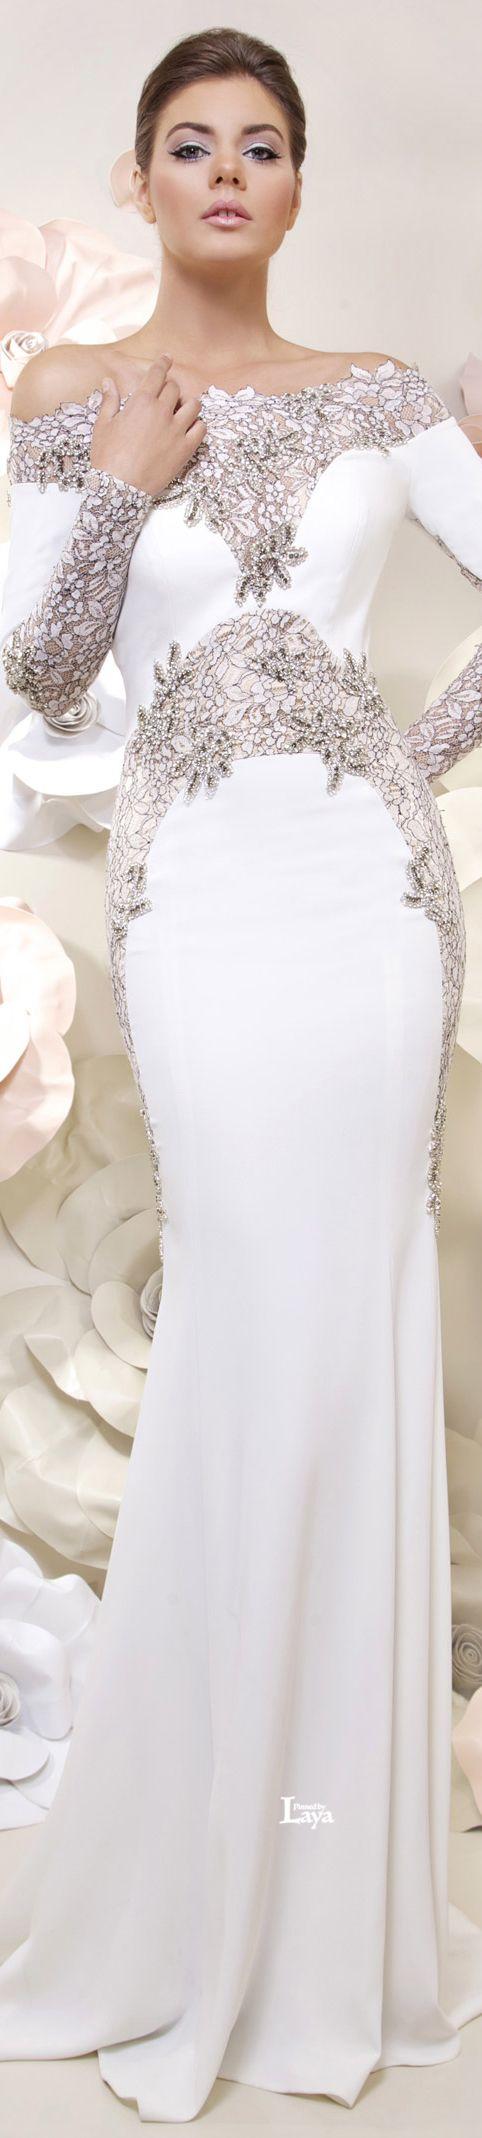 Tarek sinno spring formal white gown w silver embellishments